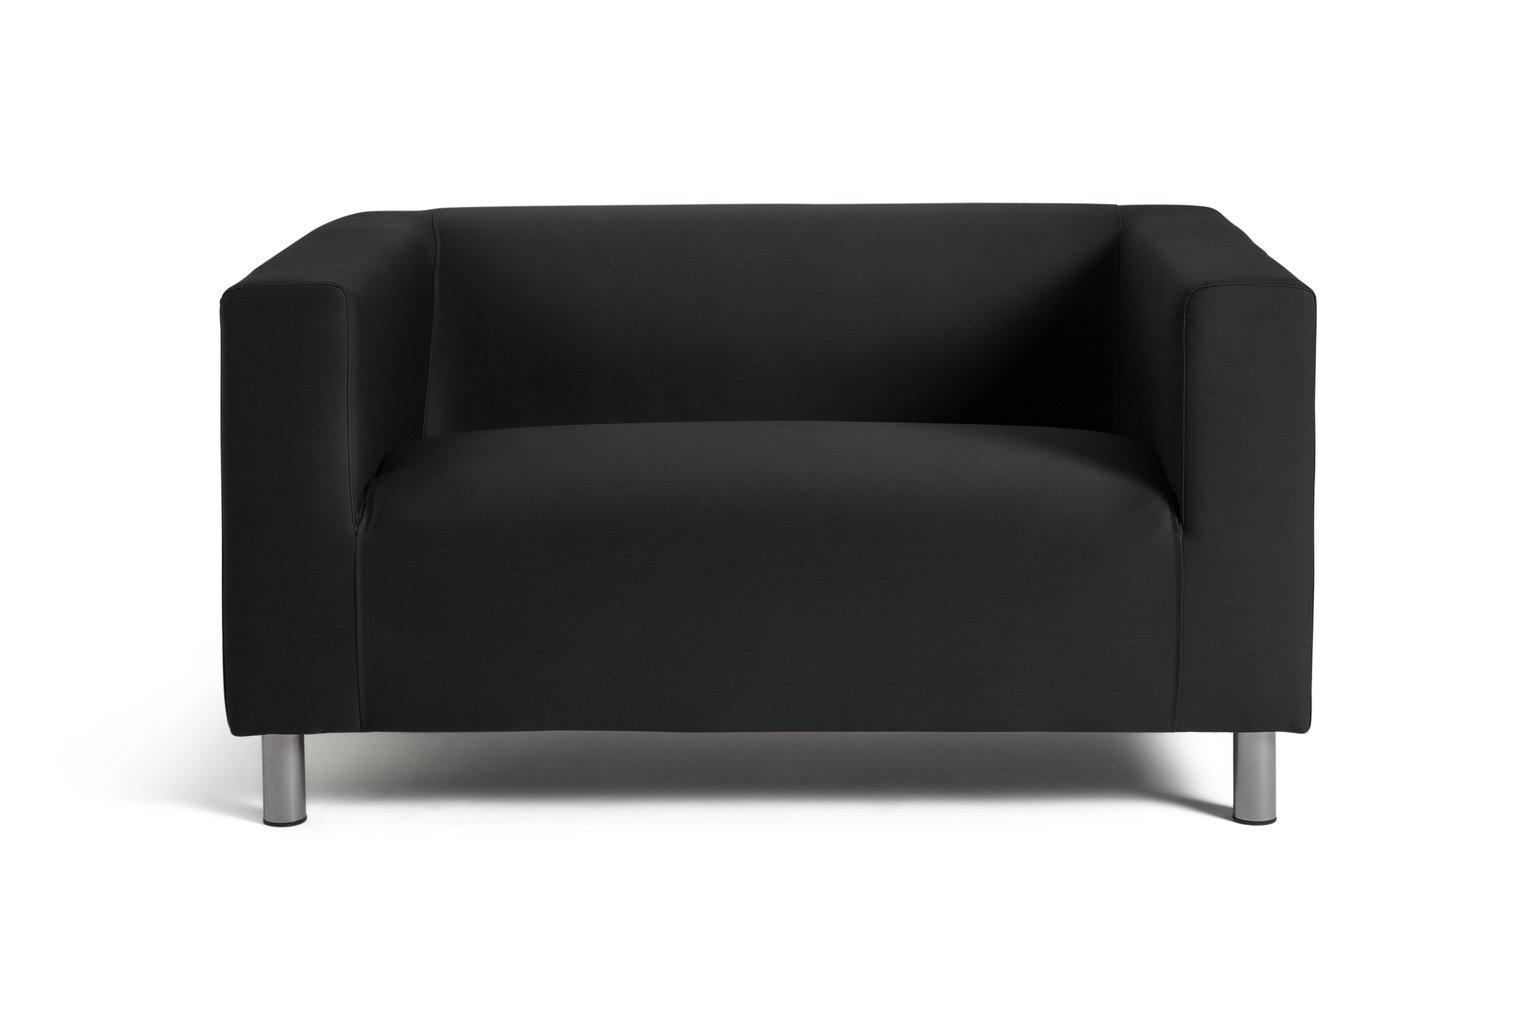 Argos Home Moda Compact 2 Seater Fabric Sofa - Black